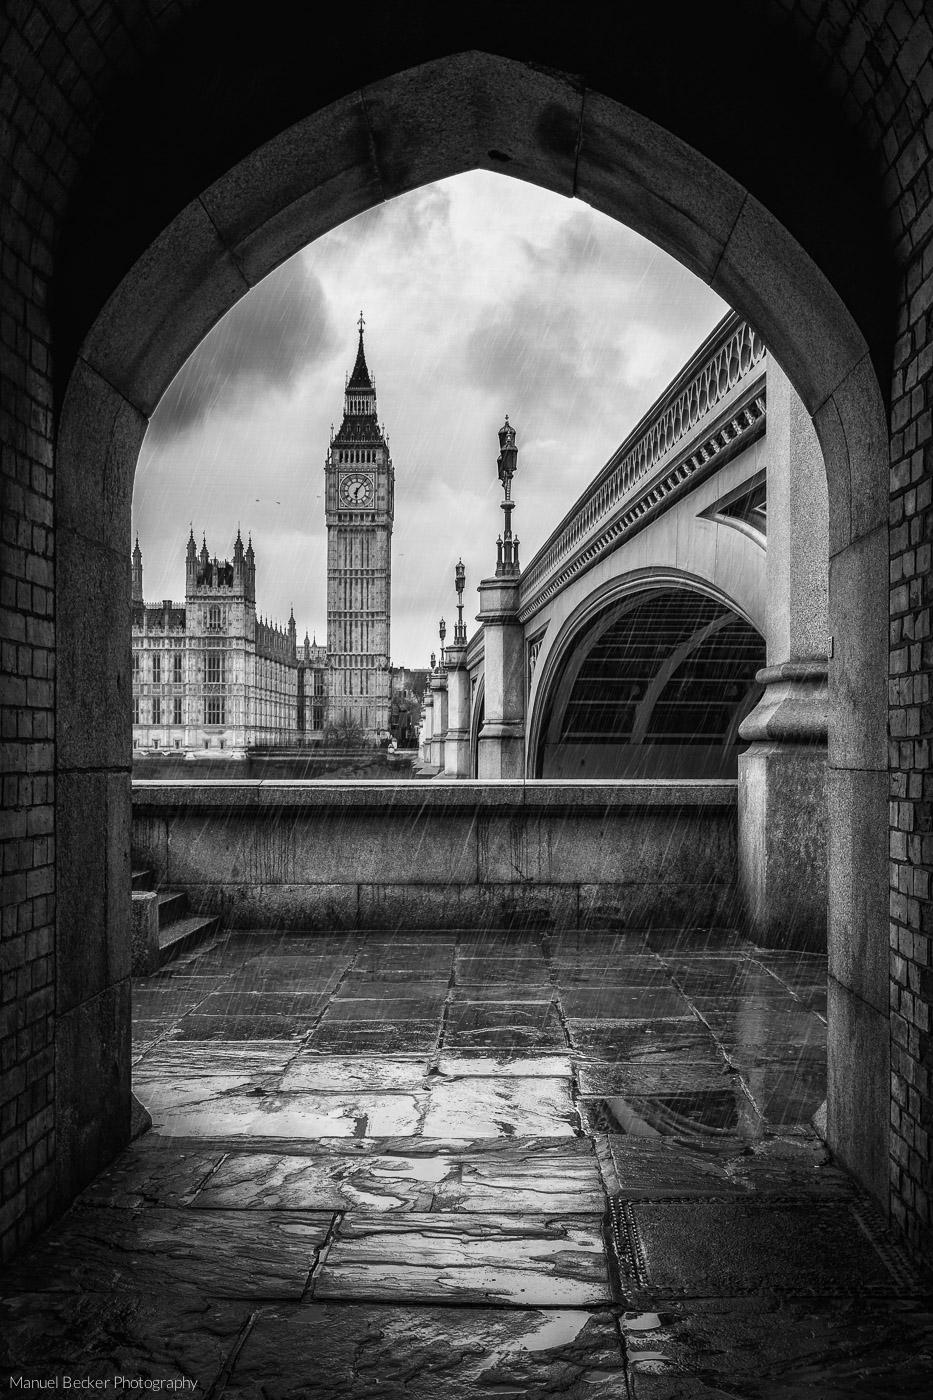 View to Big Ben, London, United Kingdom